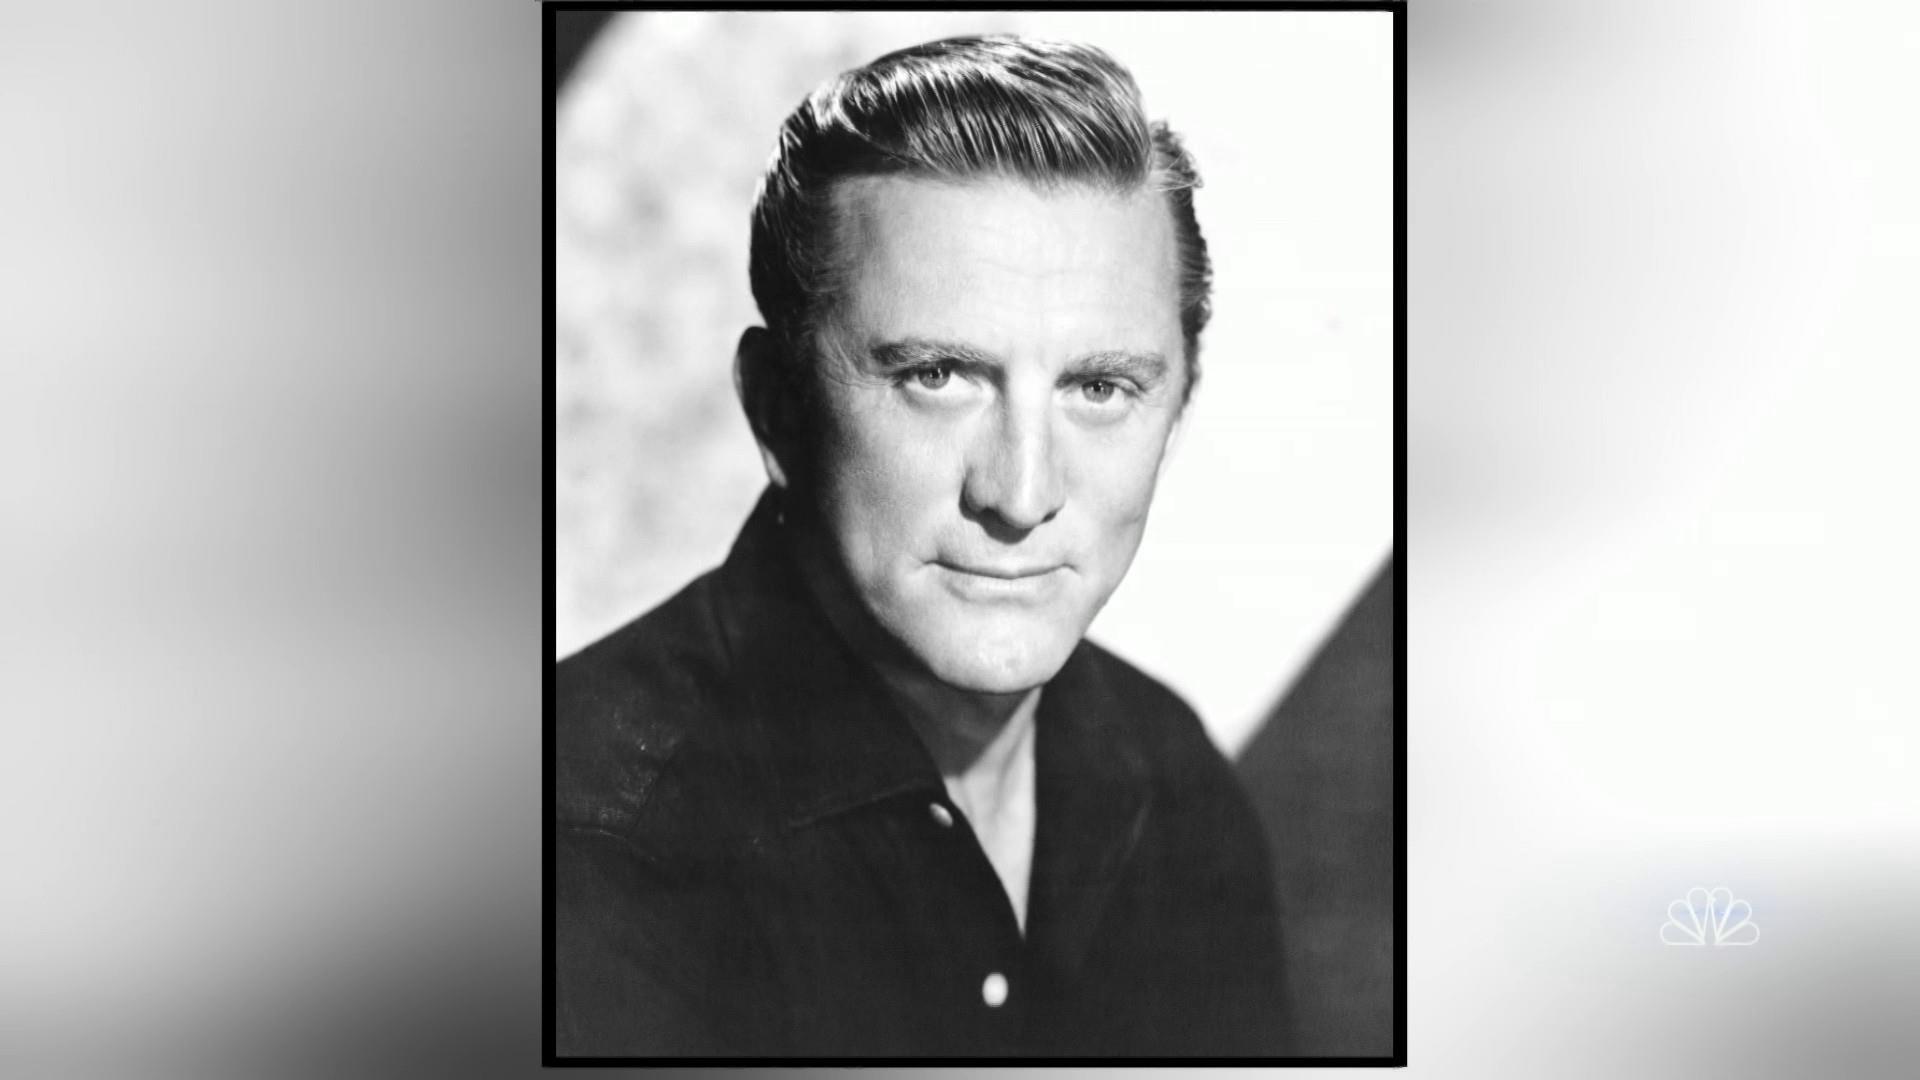 Kirk Douglas, legendary Hollywood tough guy, dead at 103